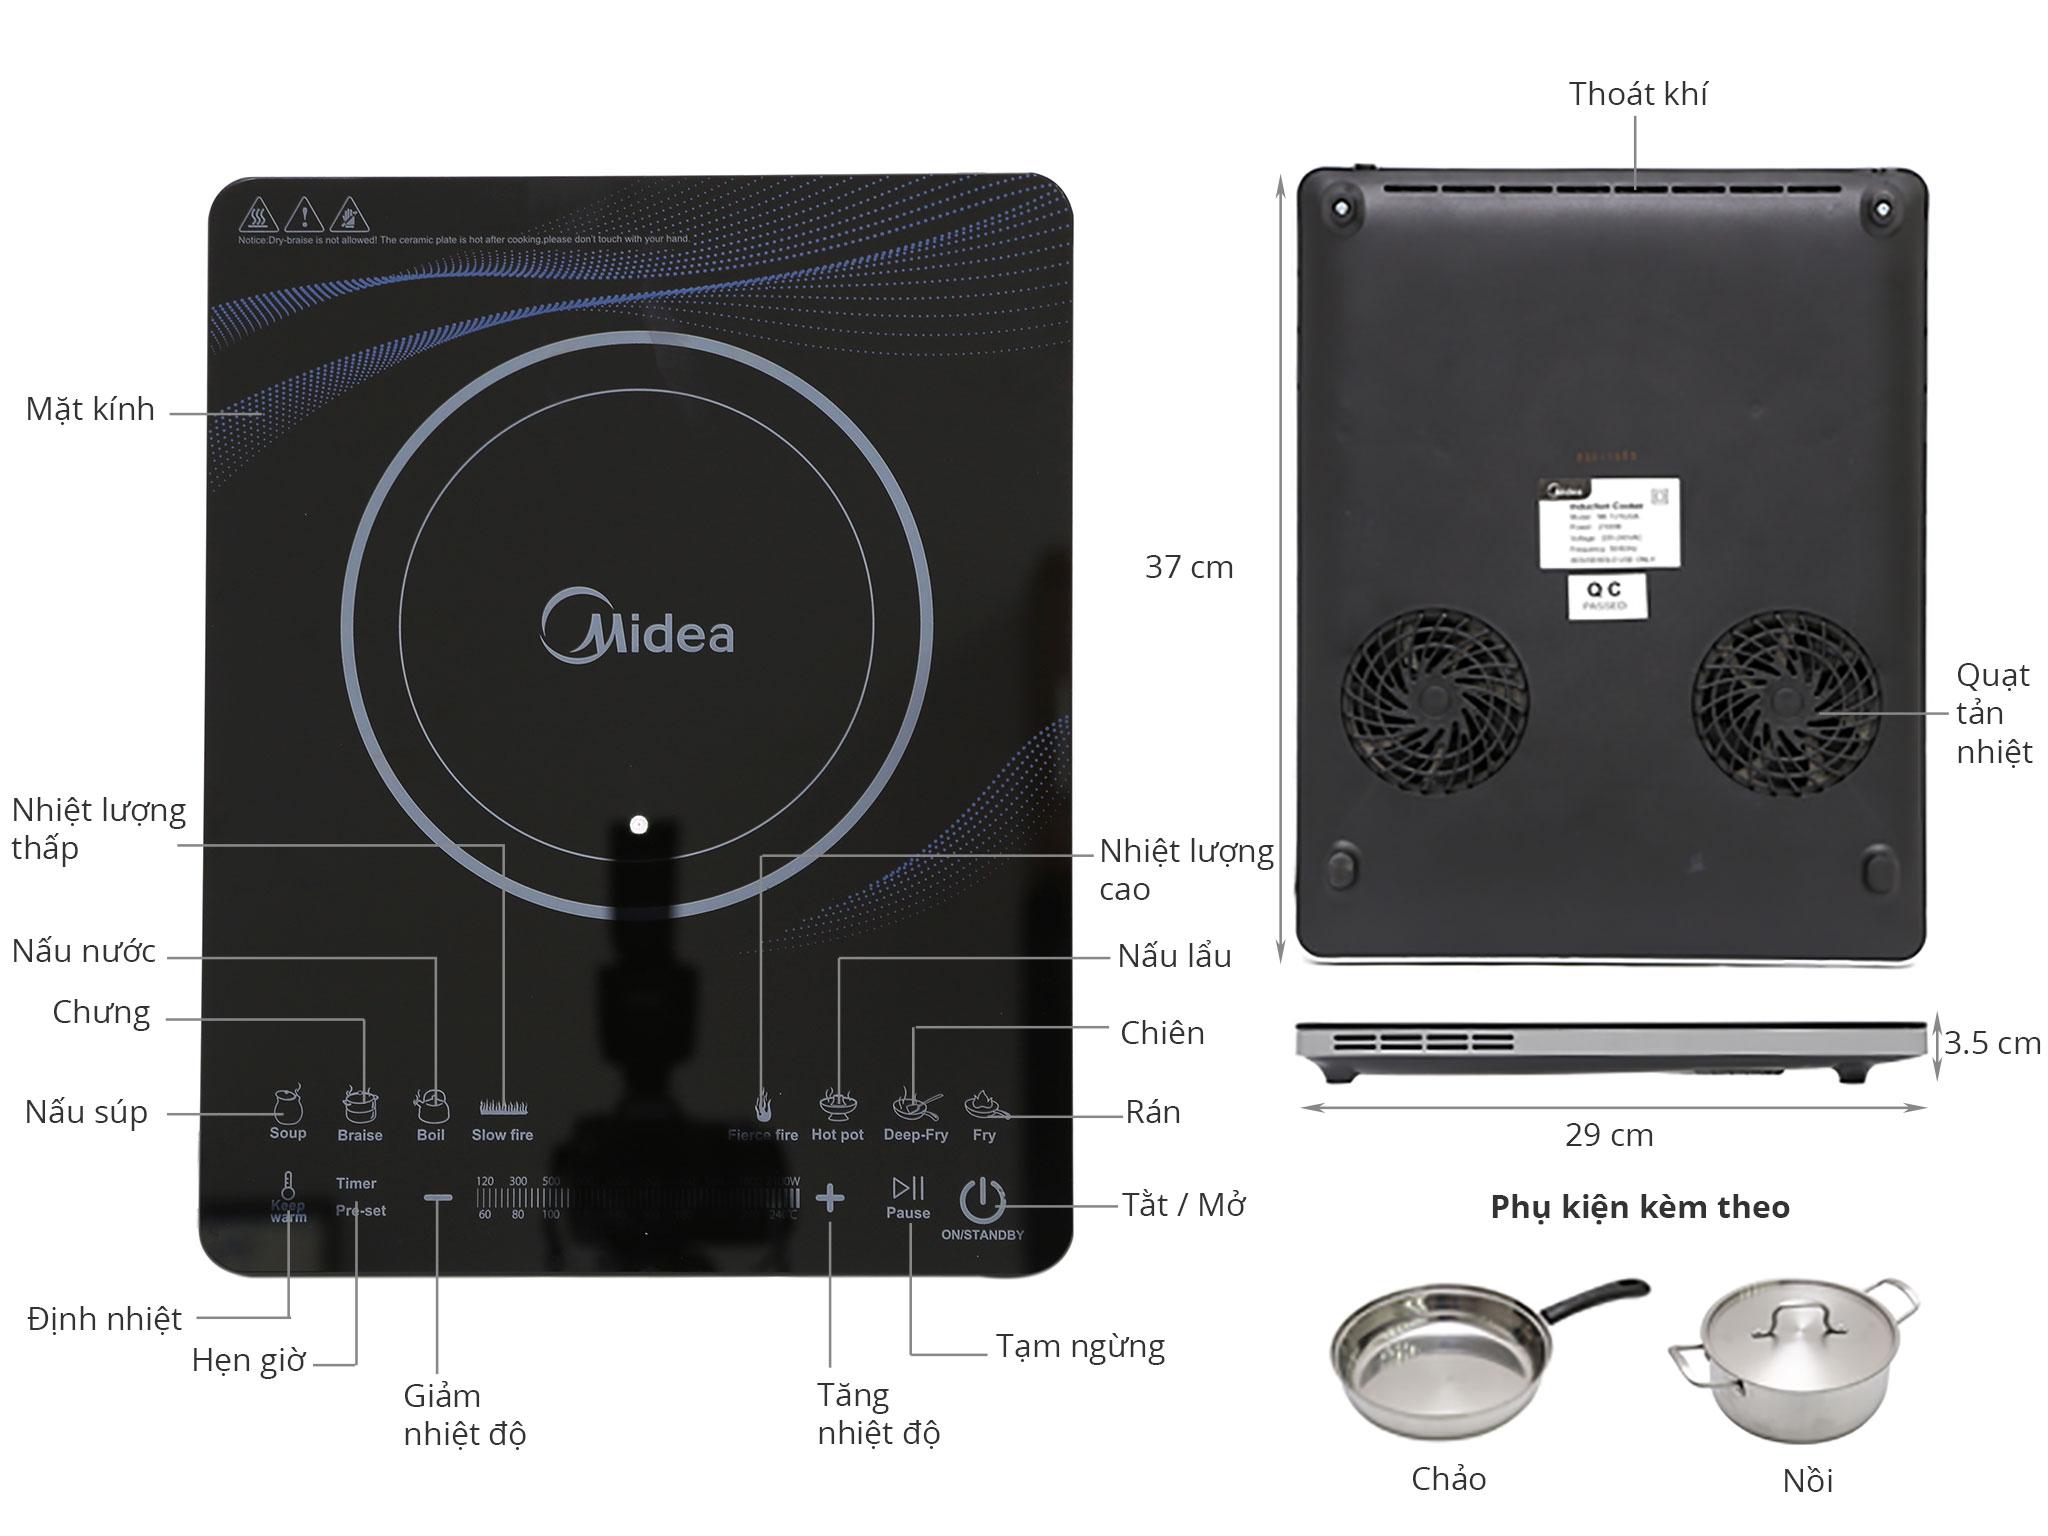 Thông số kỹ thuật Bếp từ Midea MI-T2112DA